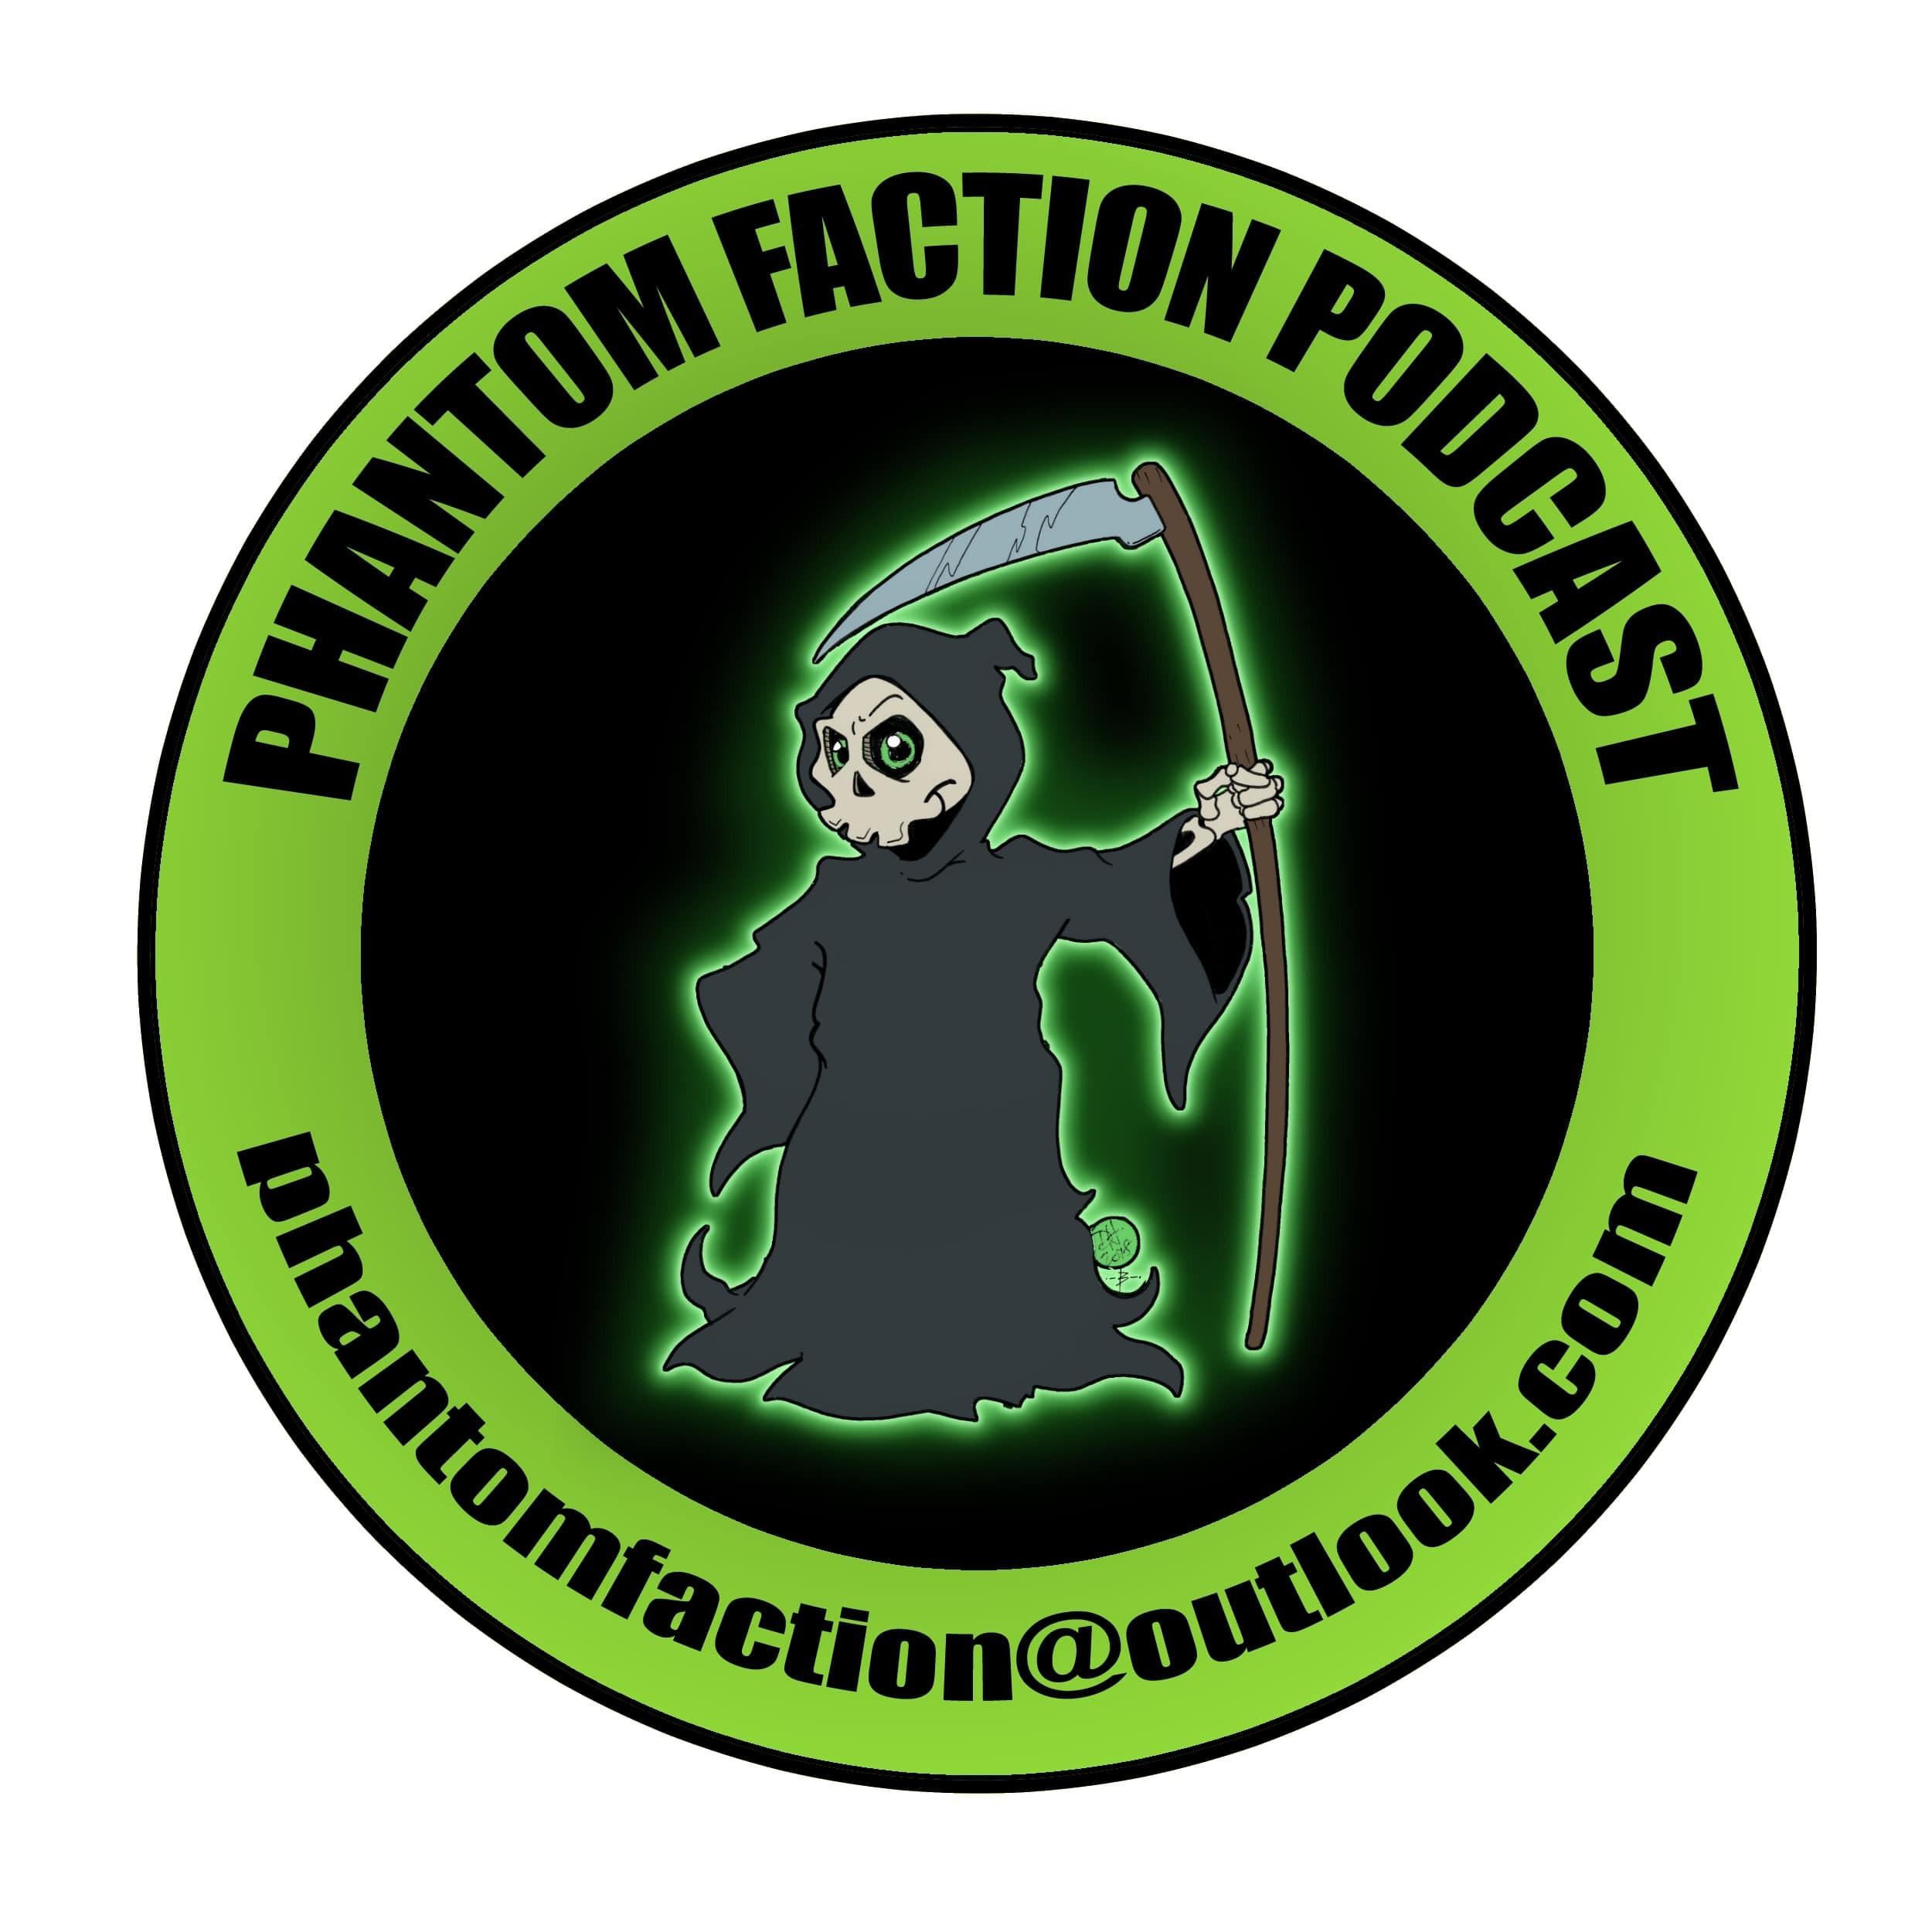 pfp episode 33 - Another Dan psychic medium